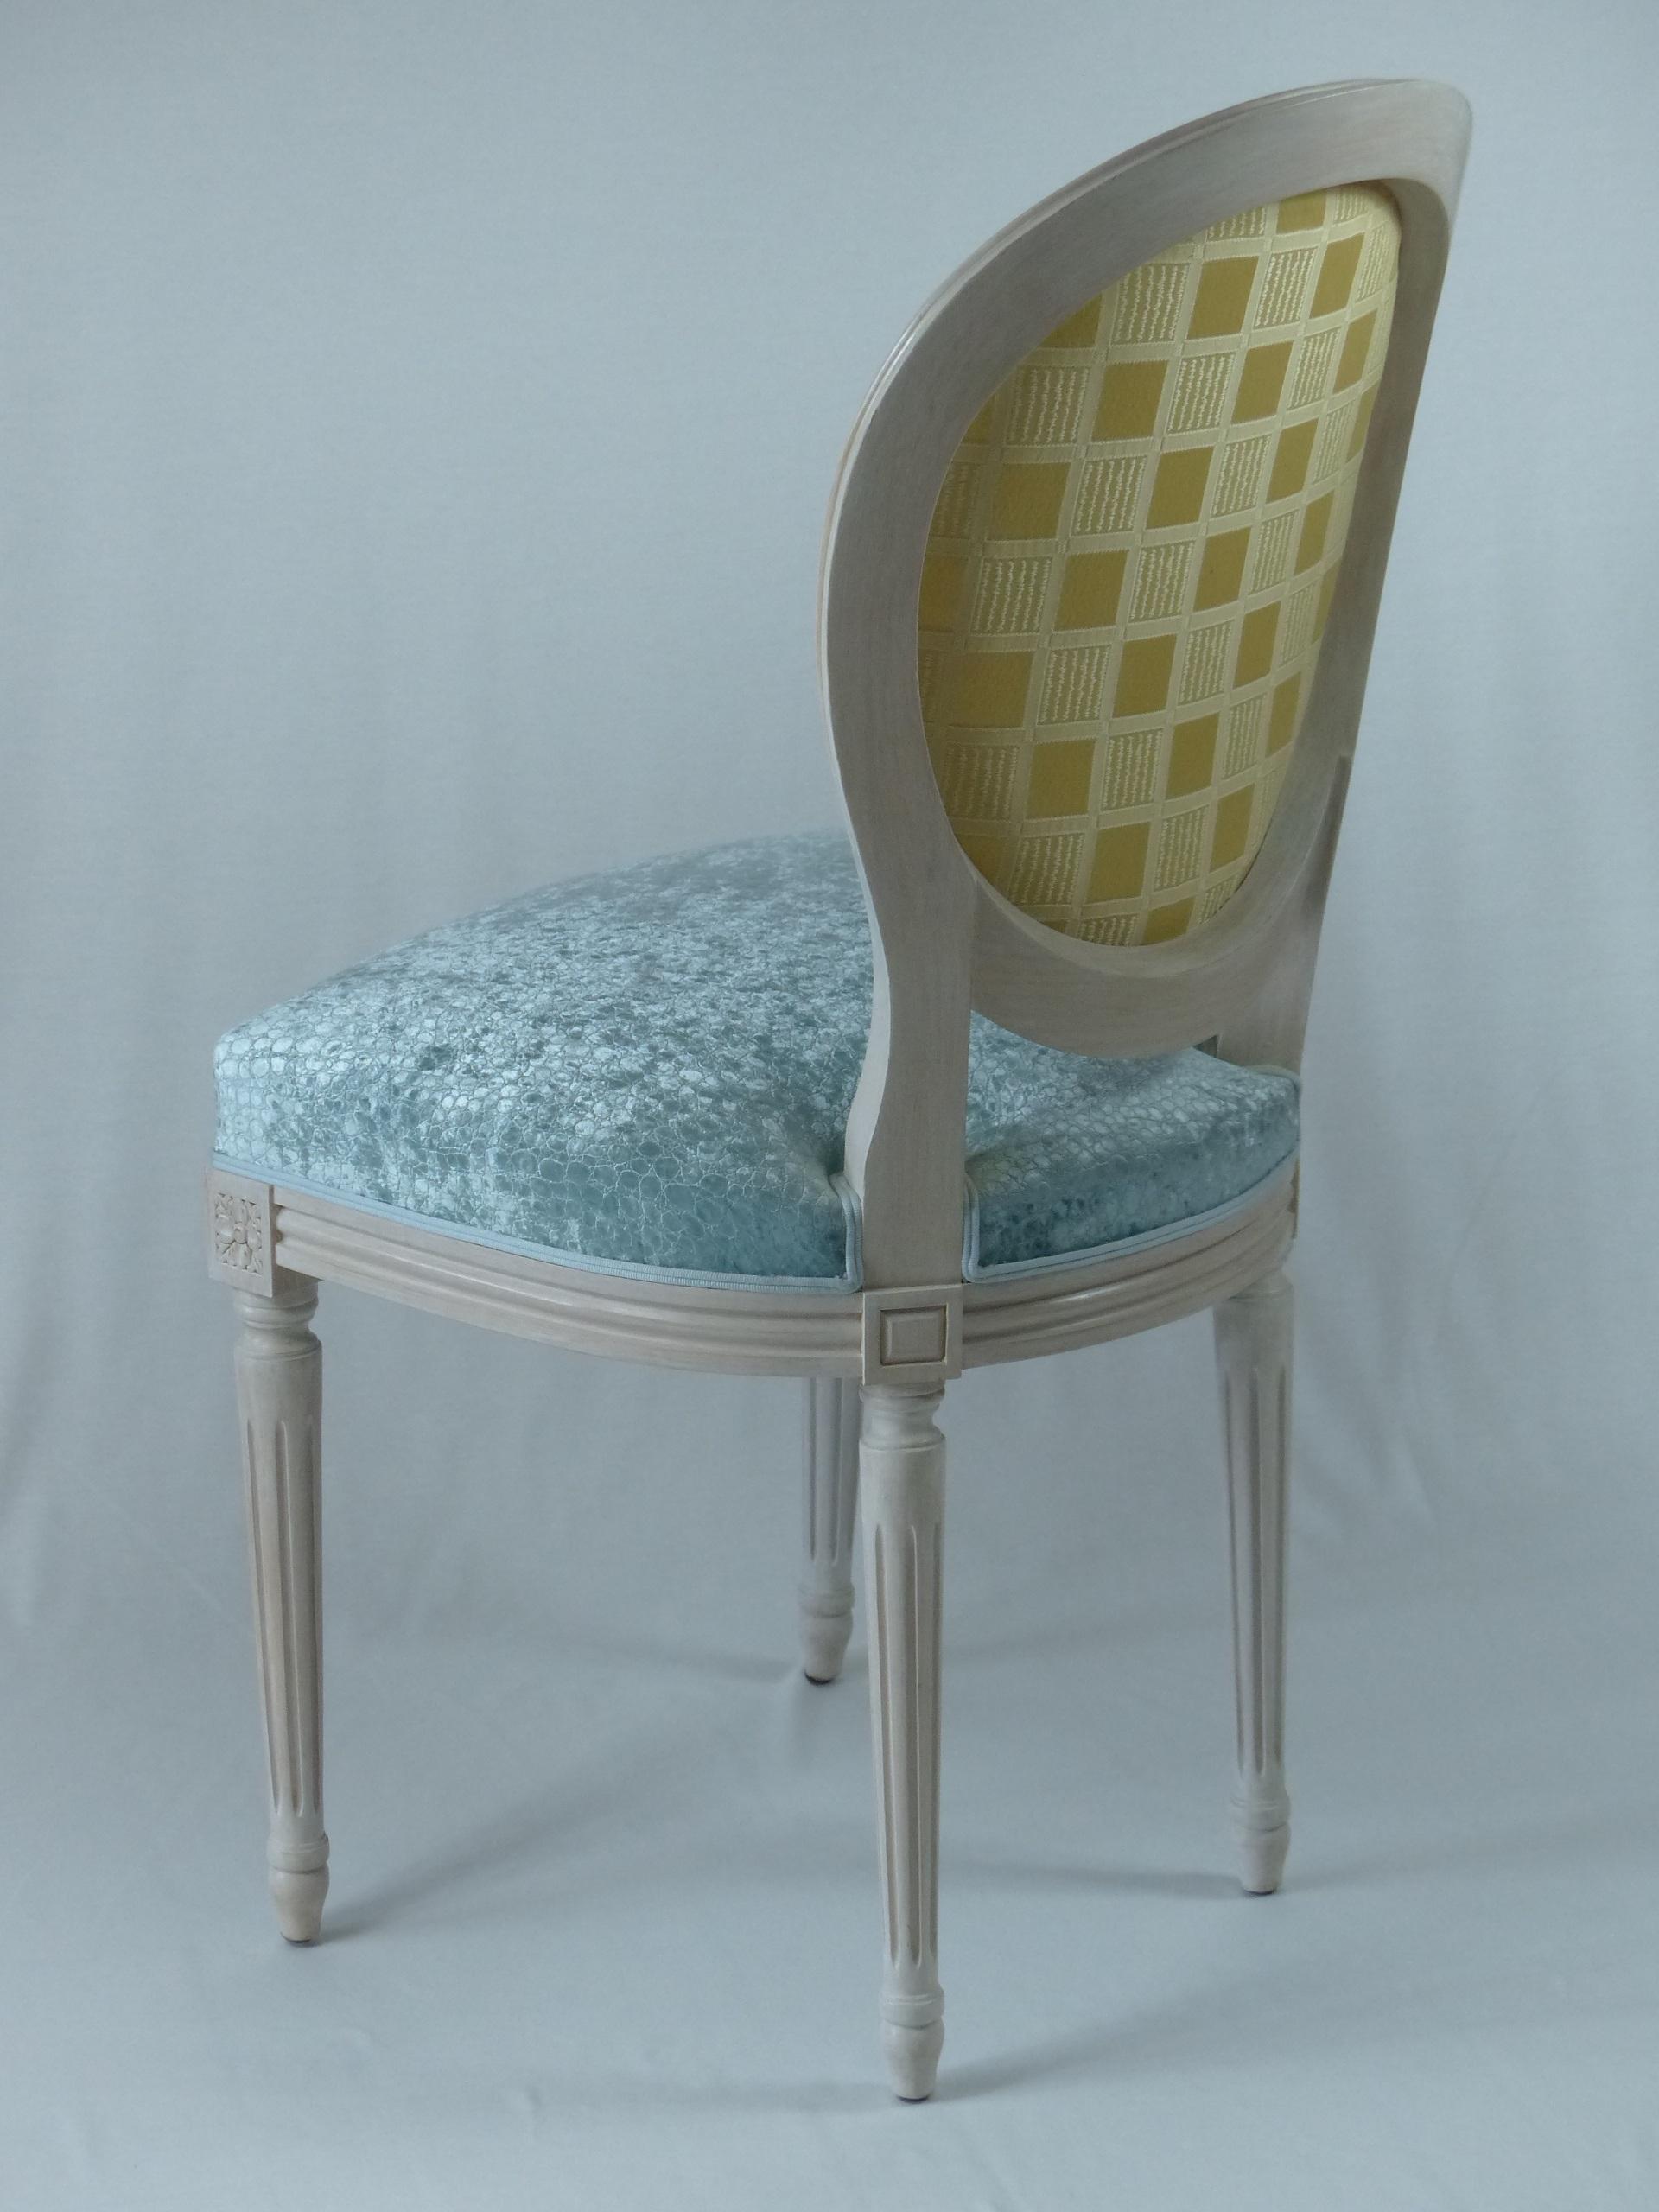 Fotos gratis : mesa, silla, mueble, tela, producto, brazo, medallón ...